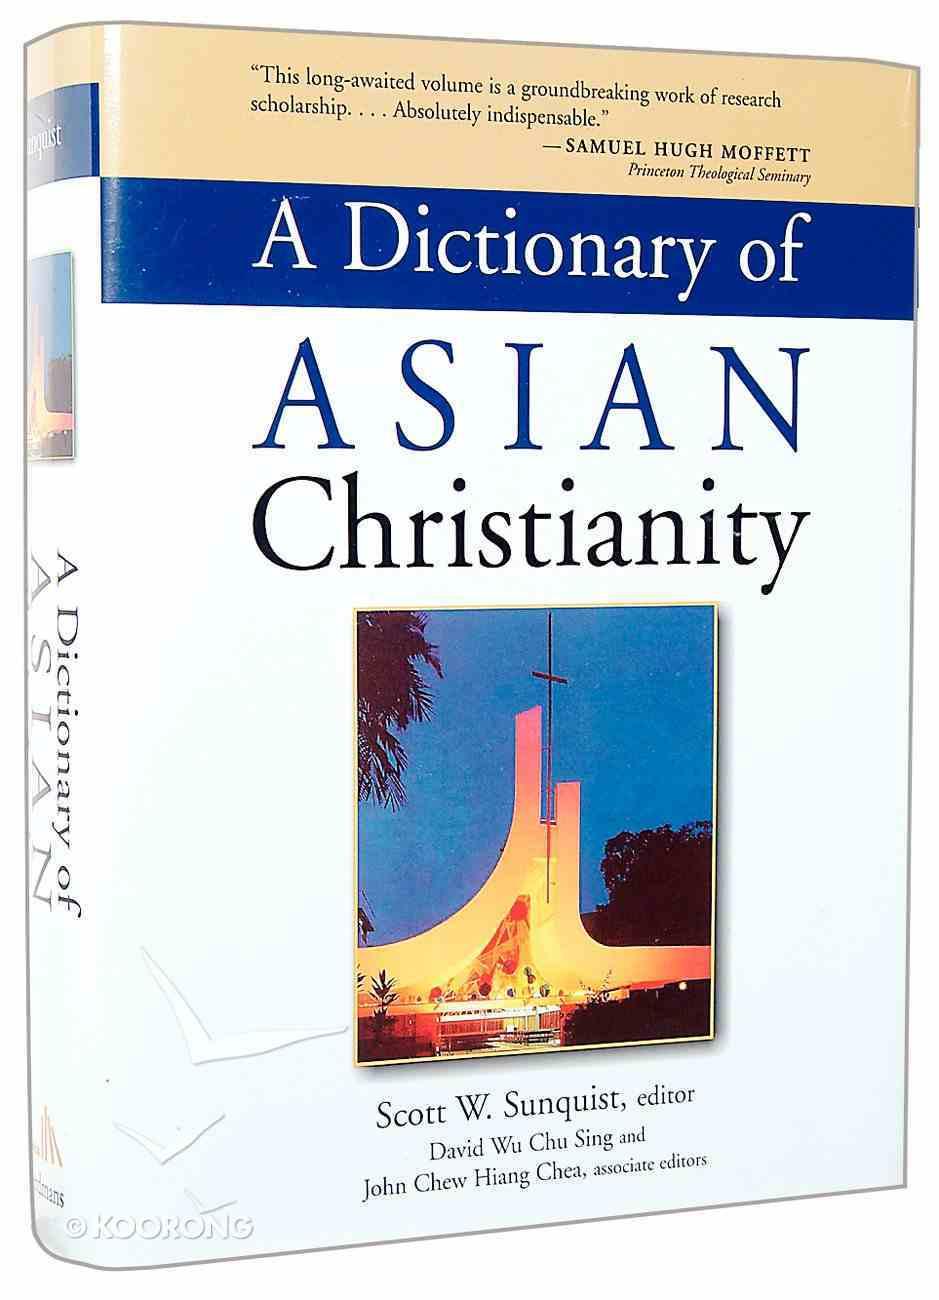 A Dictionary of Asian Christianity Hardback